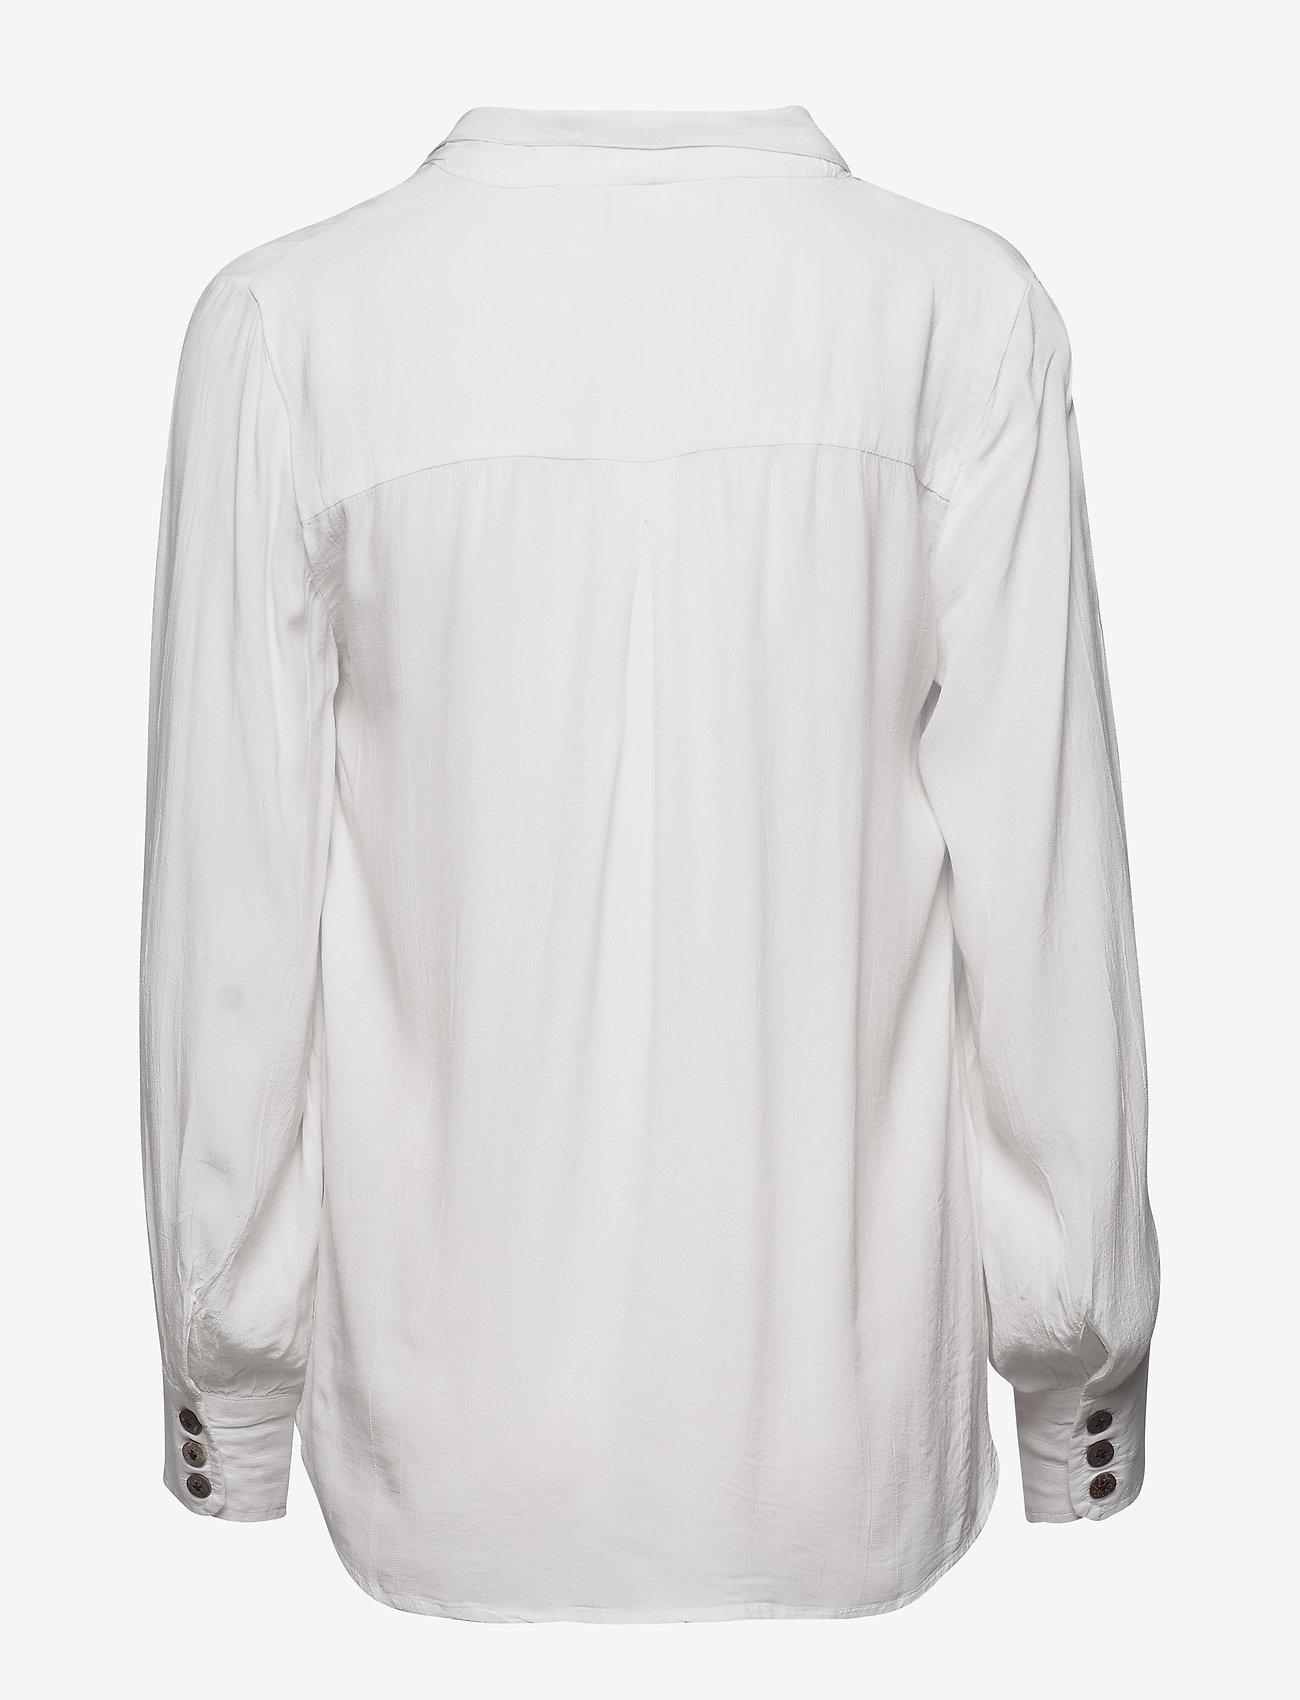 FREE/QUENT FQGIA-SH - Bluzki & Koszule OFFWHITE 11-4800 - Kobiety Odzież.